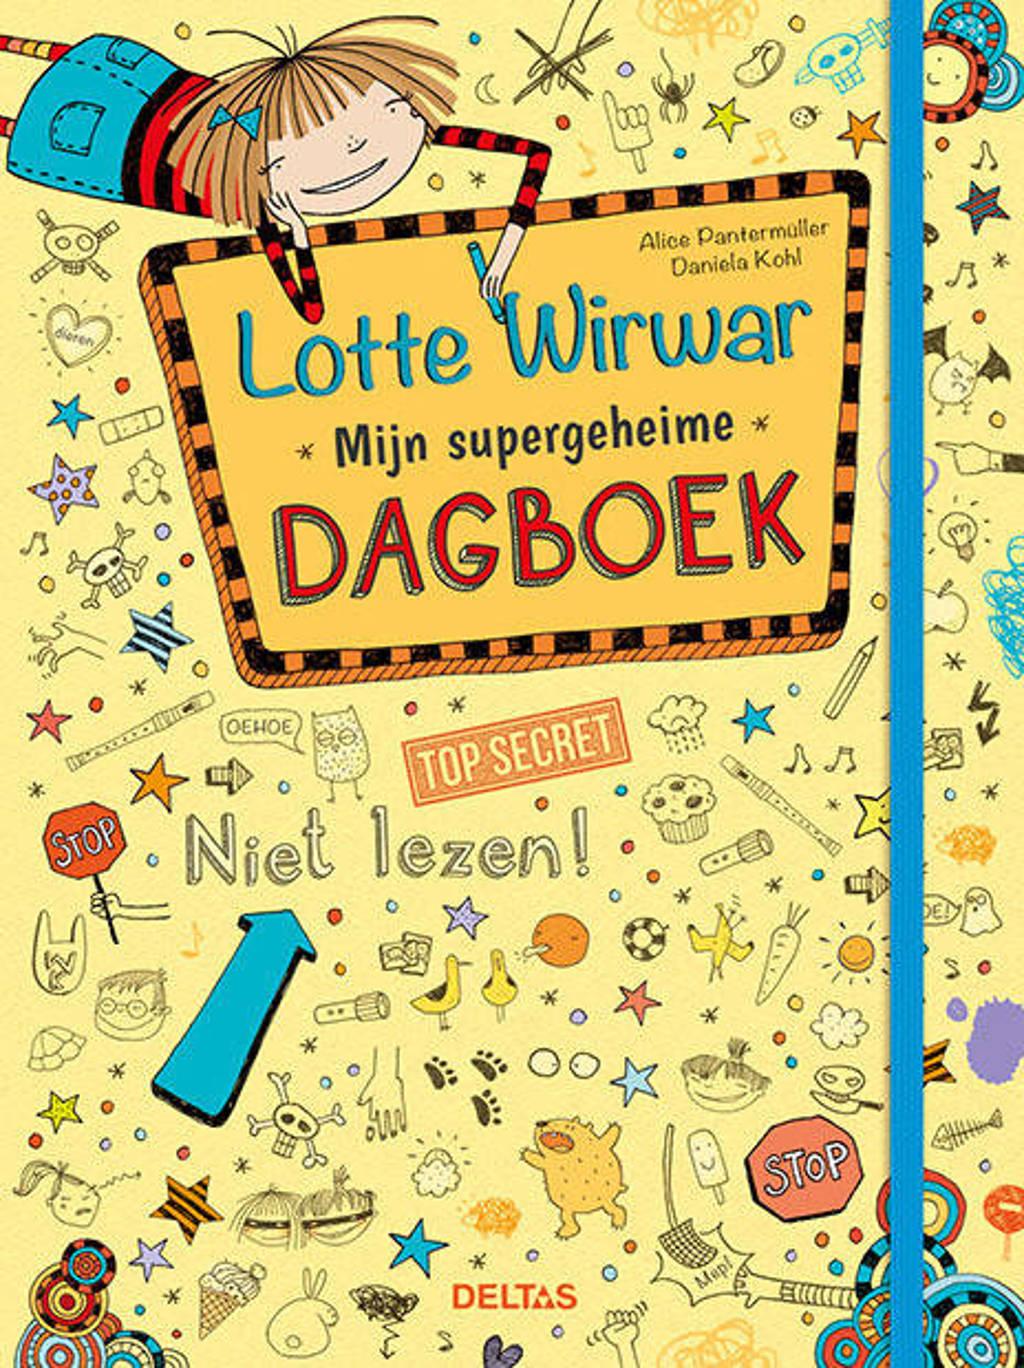 Lotte Wirwar: Mijn supergeheime dagboek - Alice Pantermüller